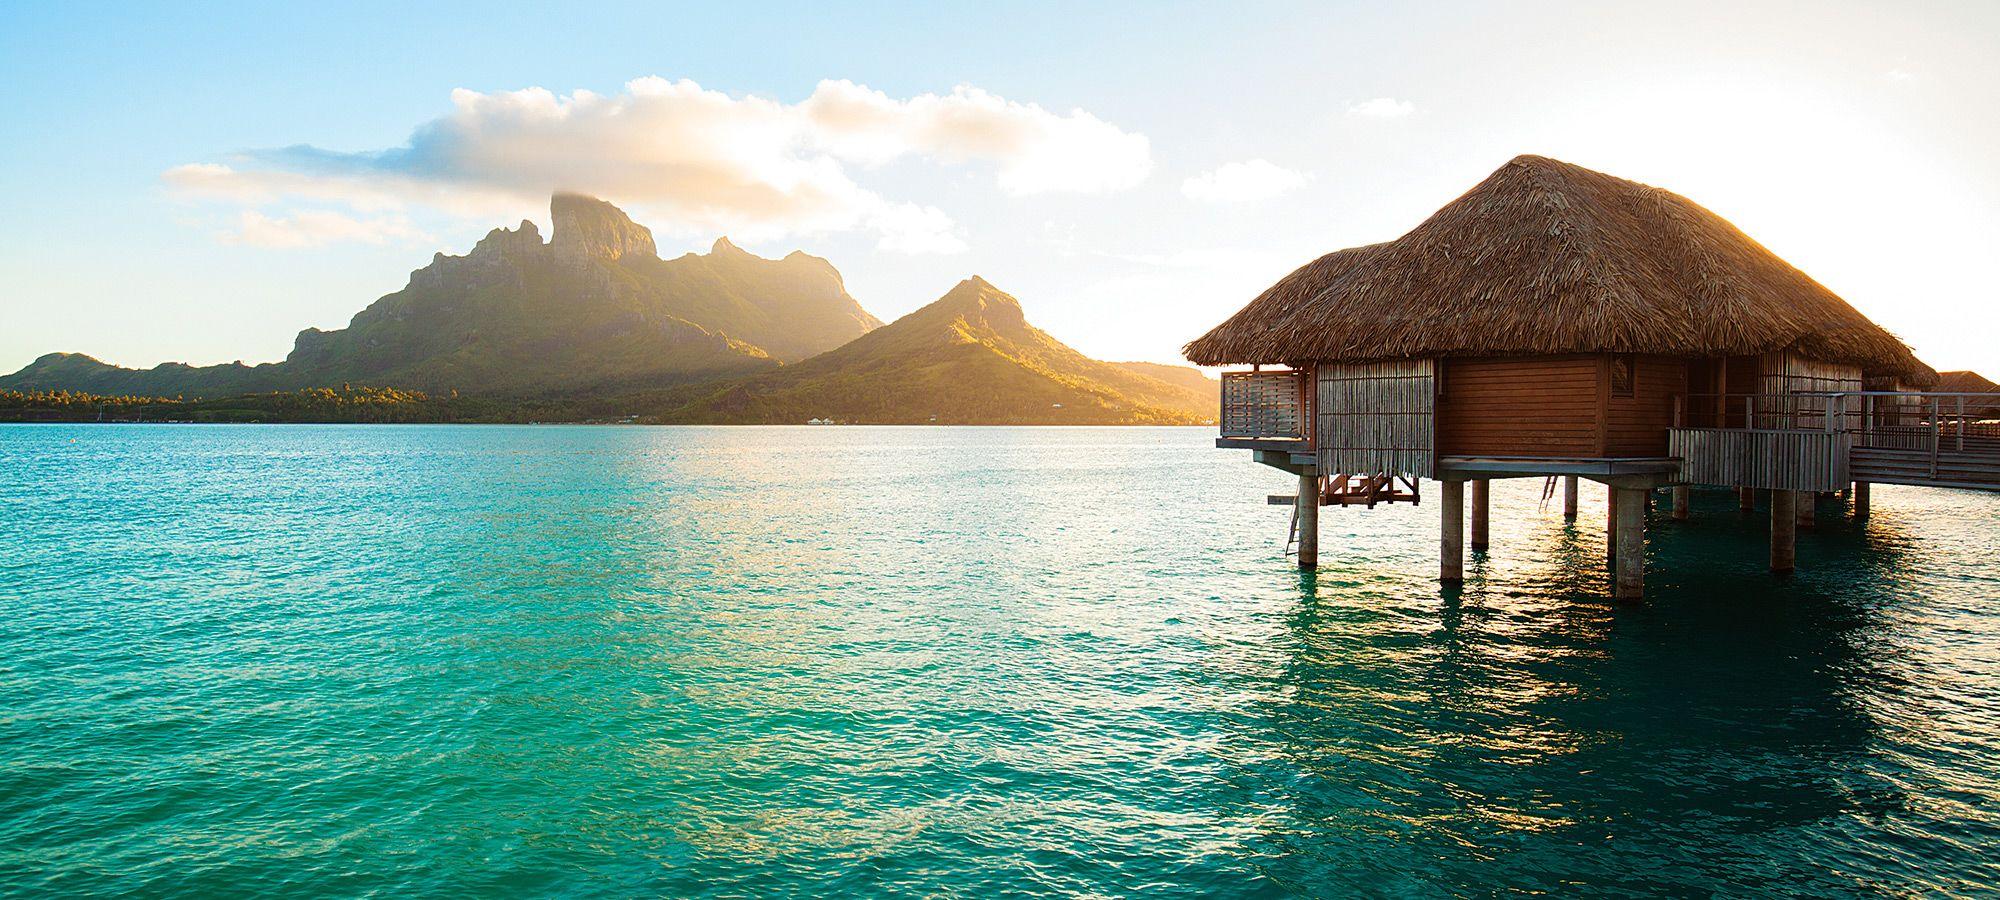 islands-homepage-overwater-bungalow-toutoverwater-bungalow-tout2.jpg